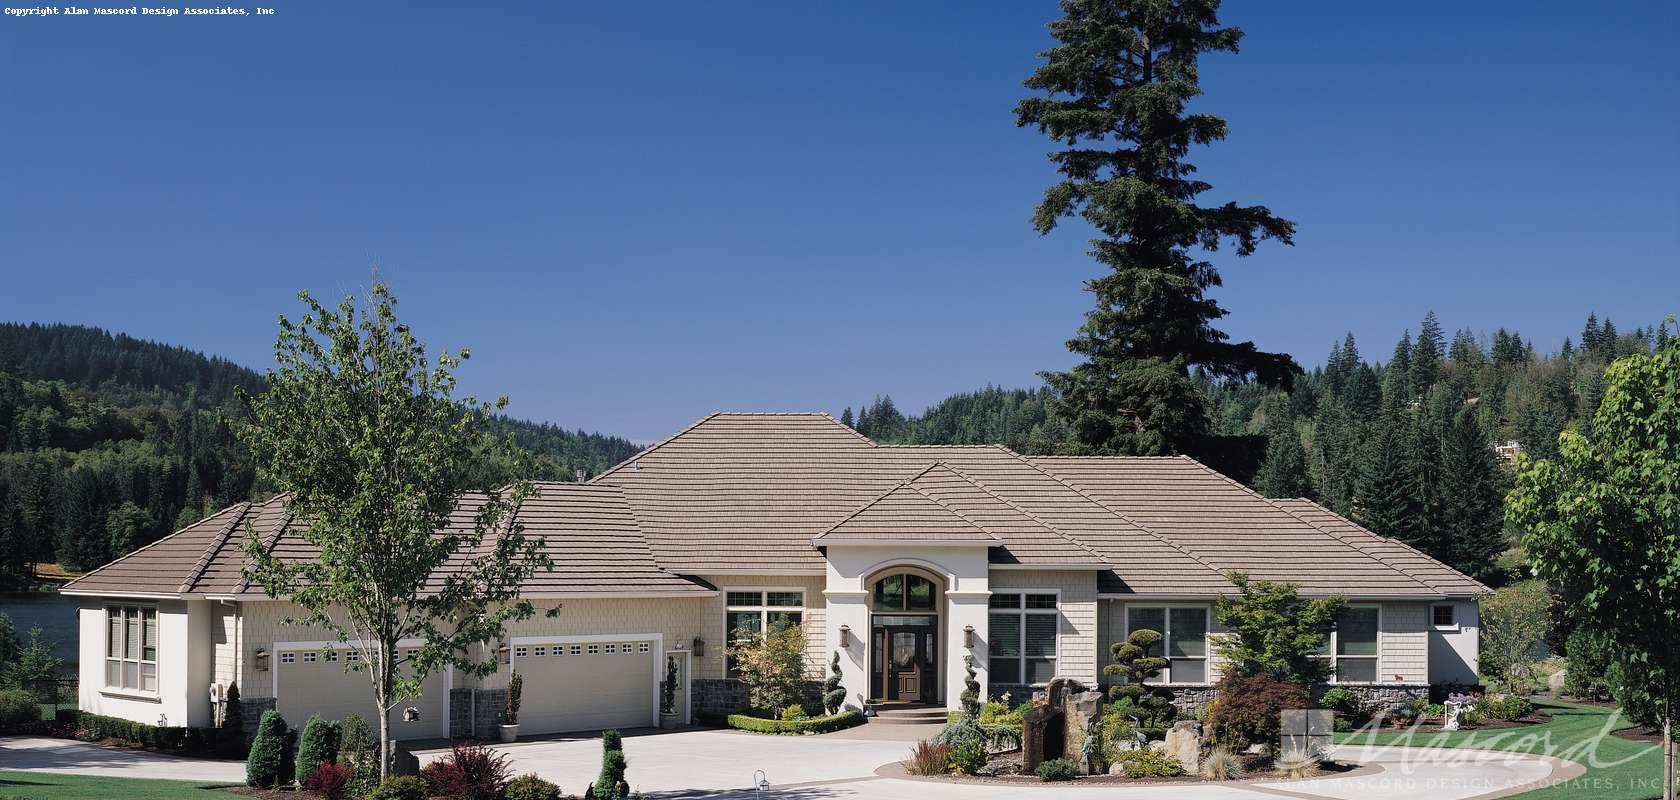 Mascord House Plan 1310: The Dahlberg